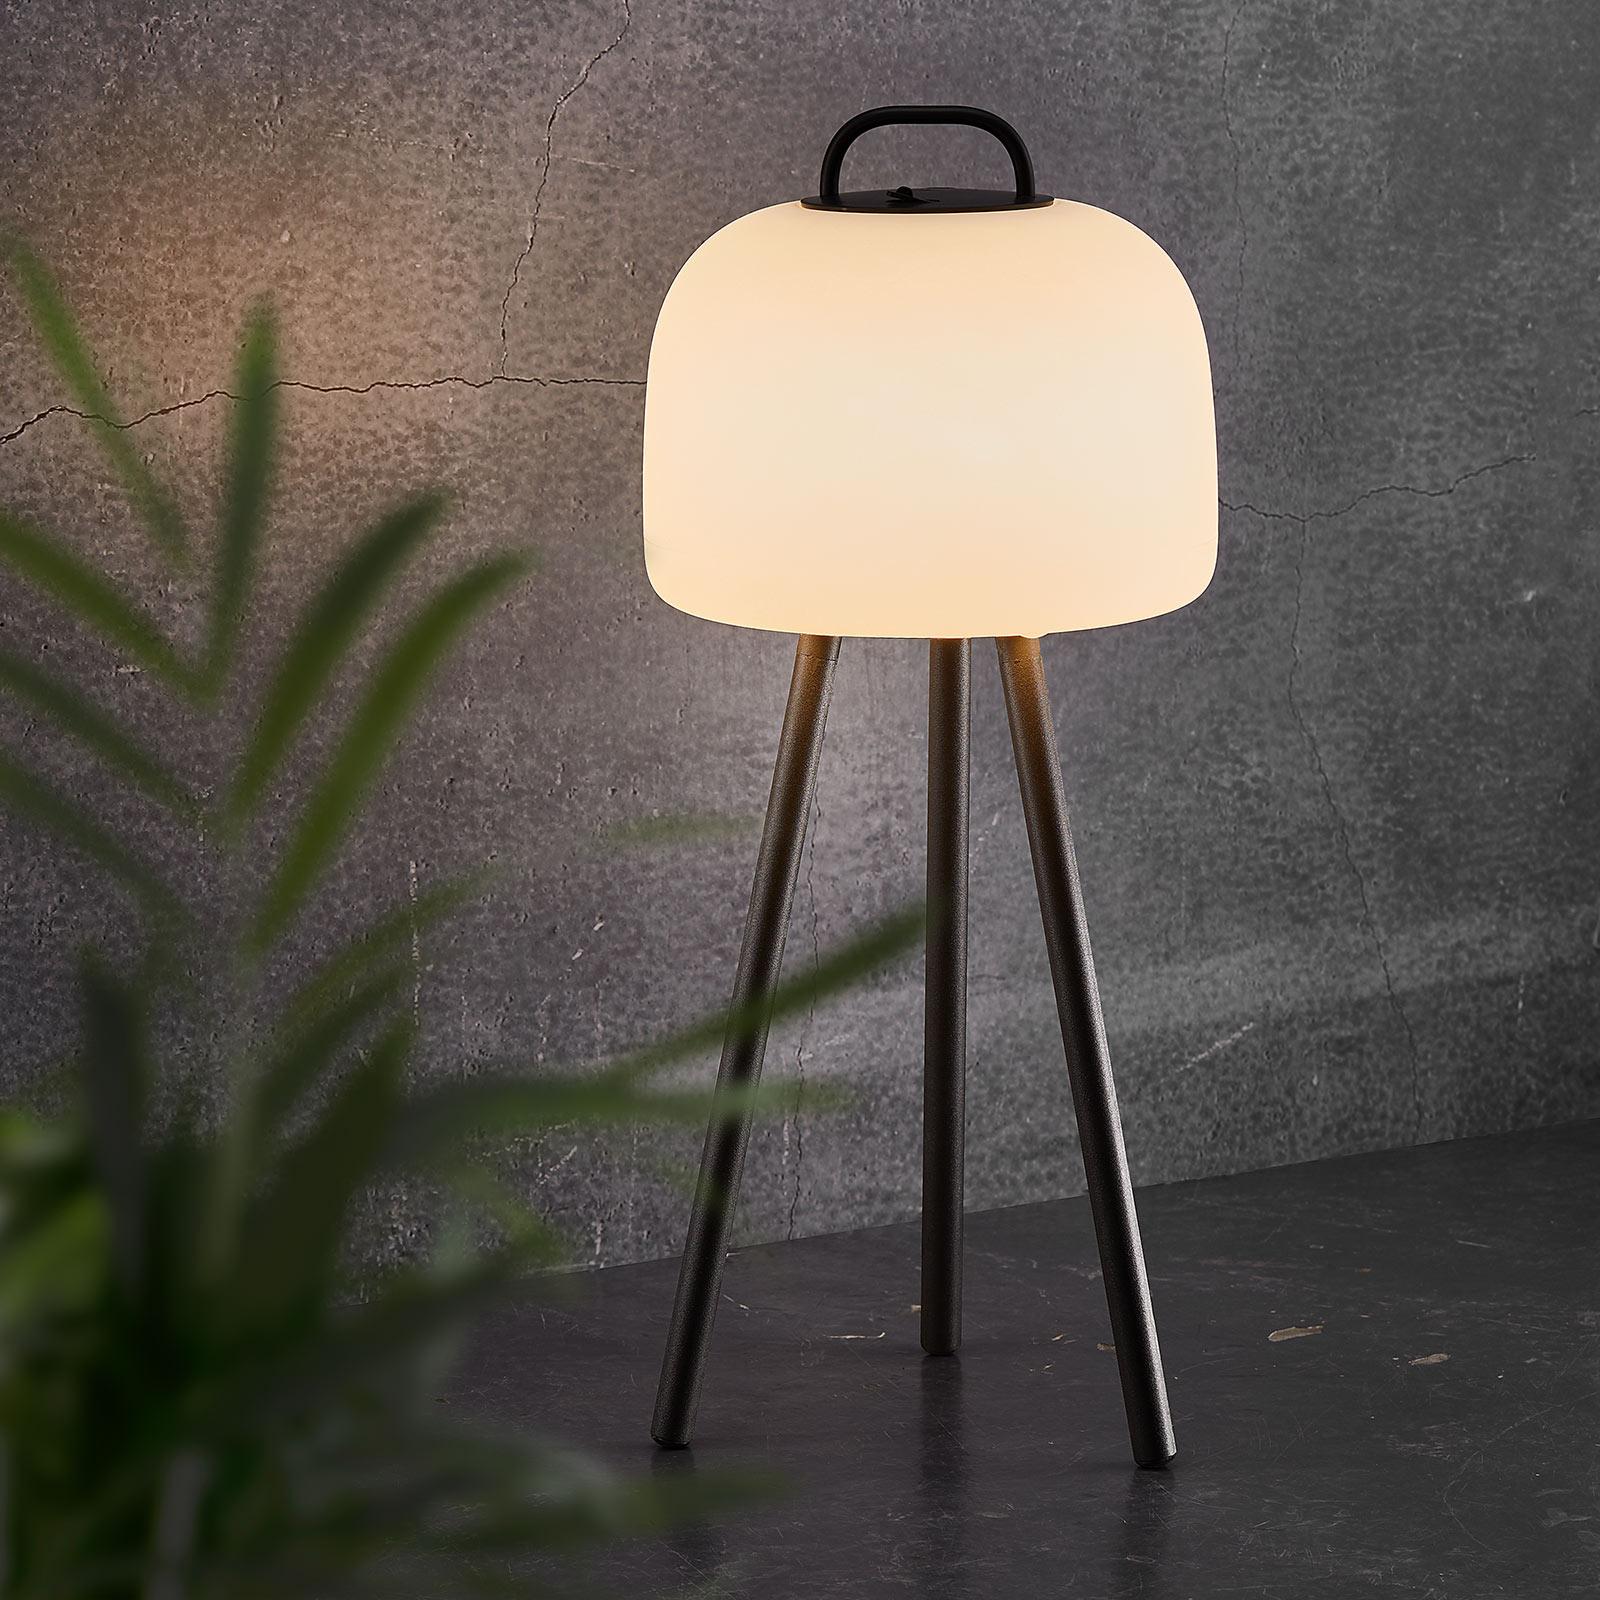 LED-Tischleuchte Kettle Tripod Metall, Schirm 22cm